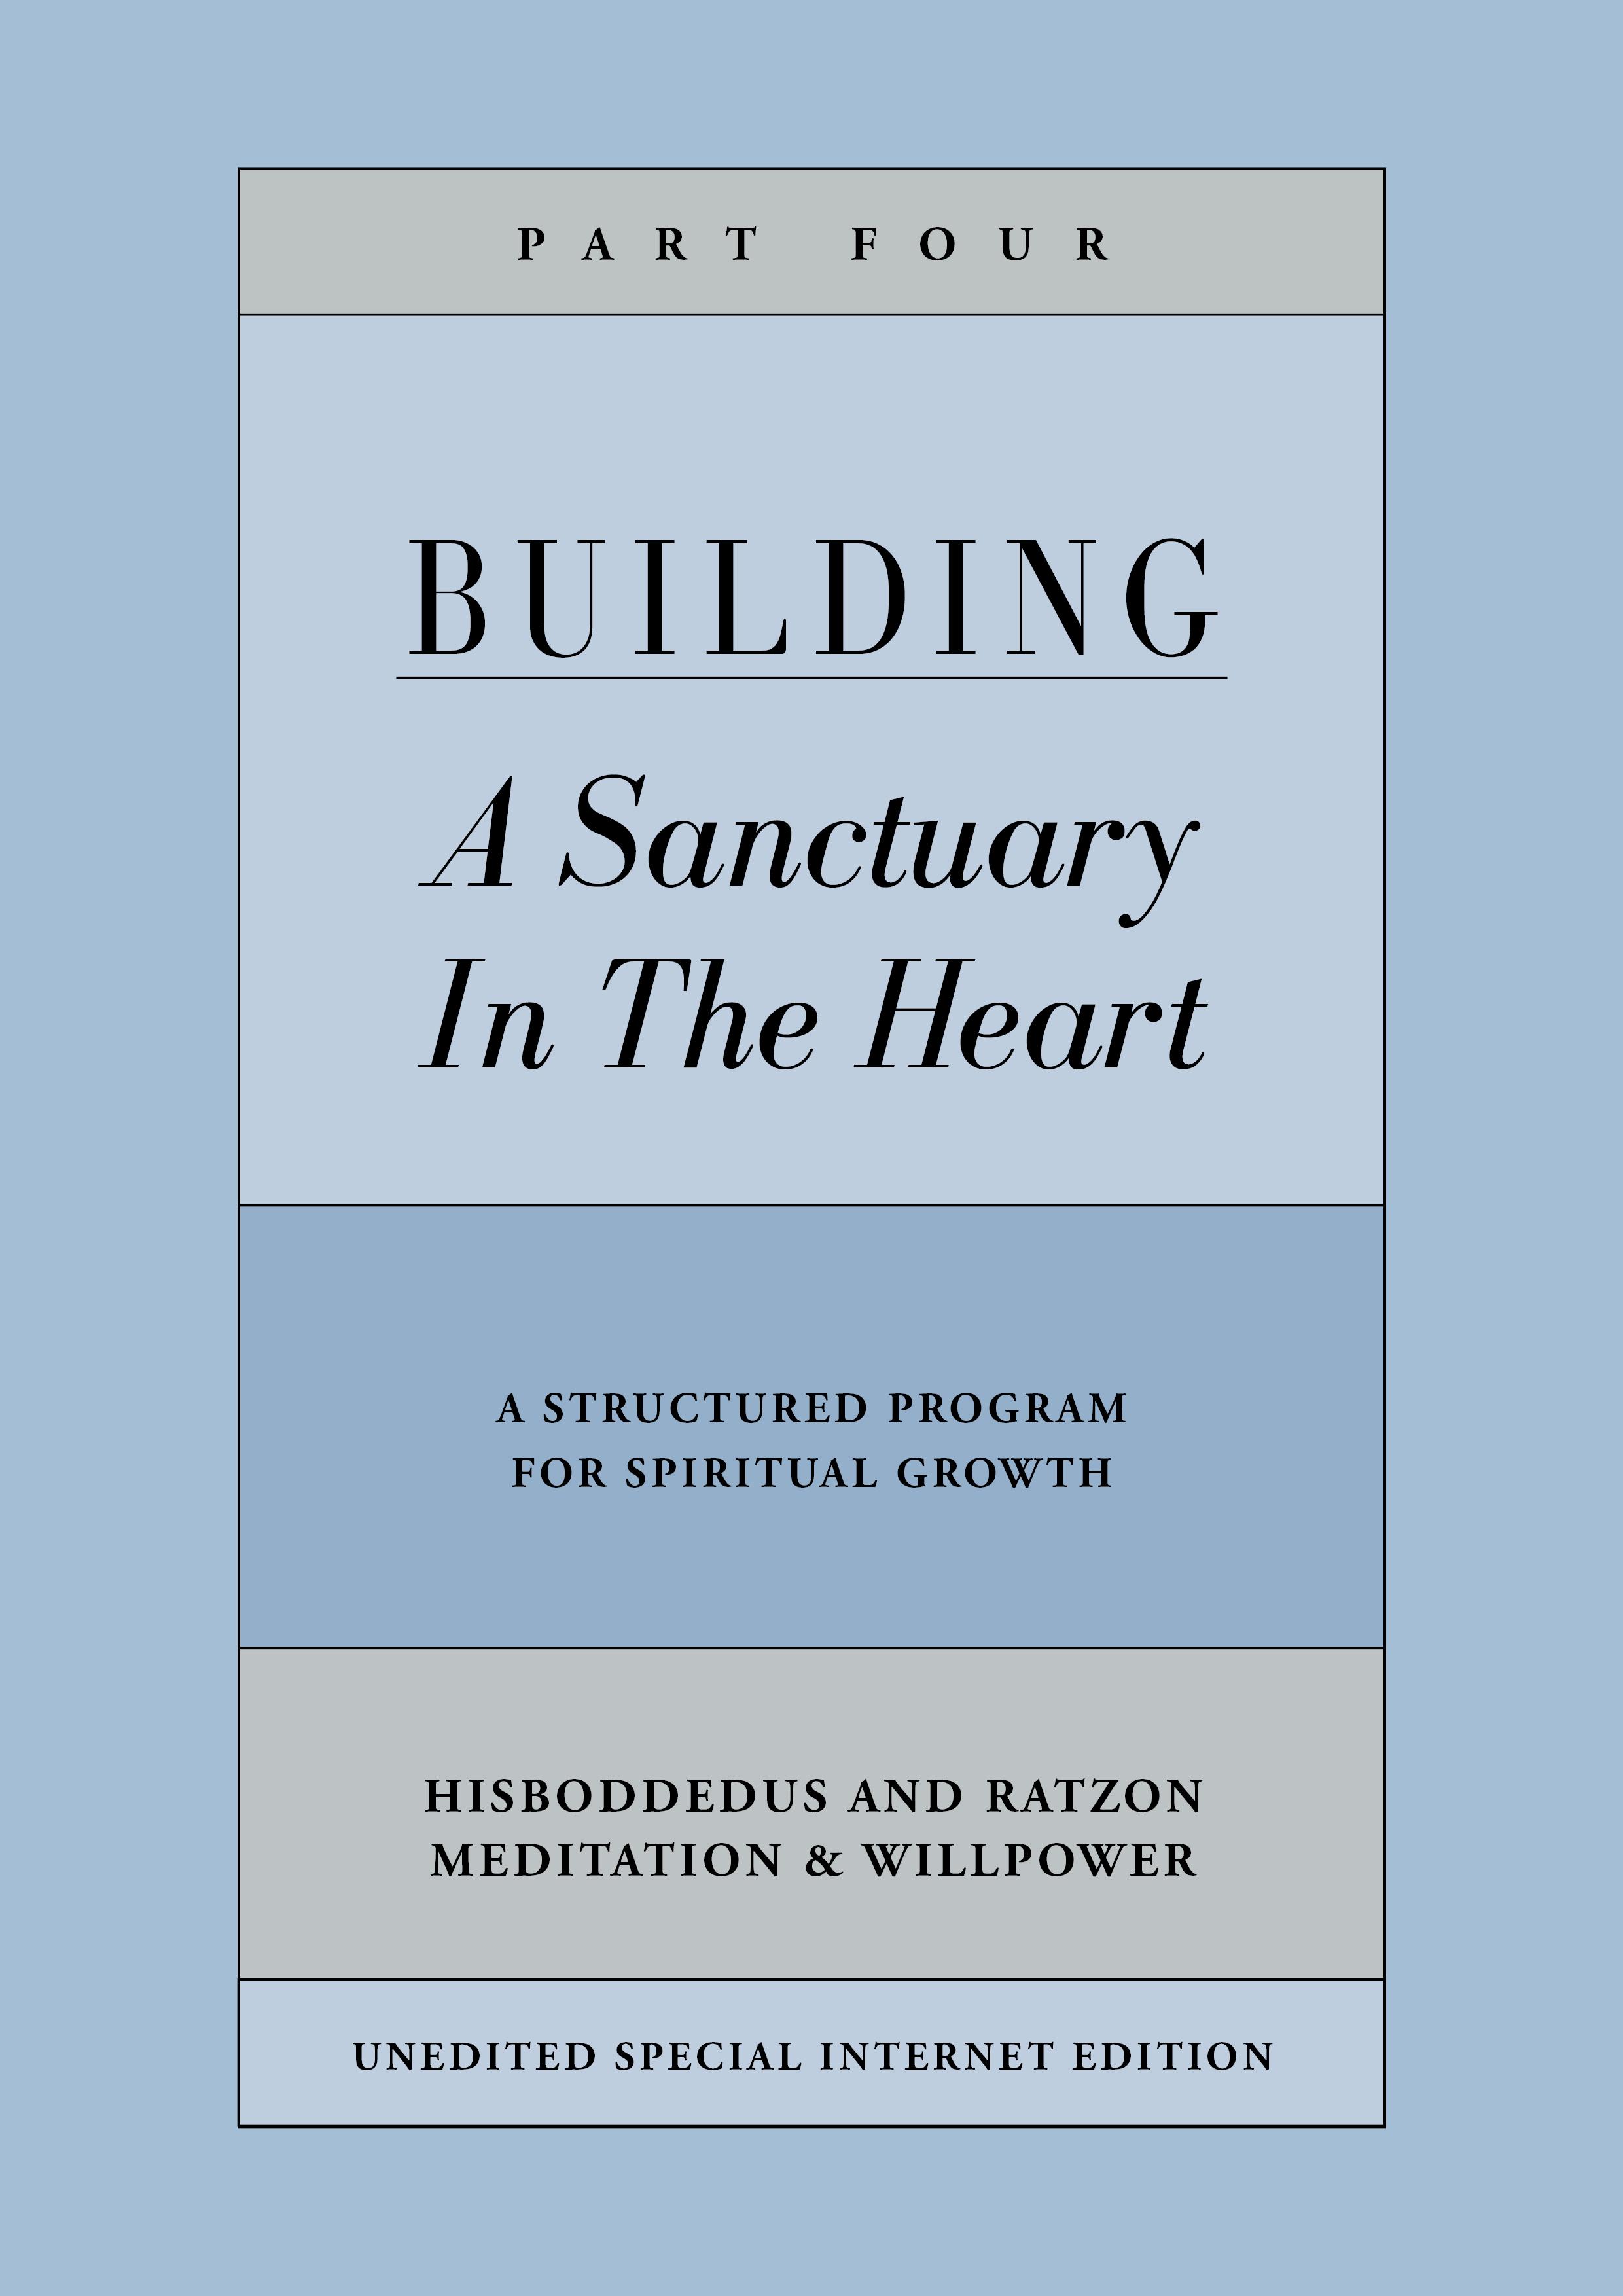 Building a Sanctuary in the Heart | Part Four